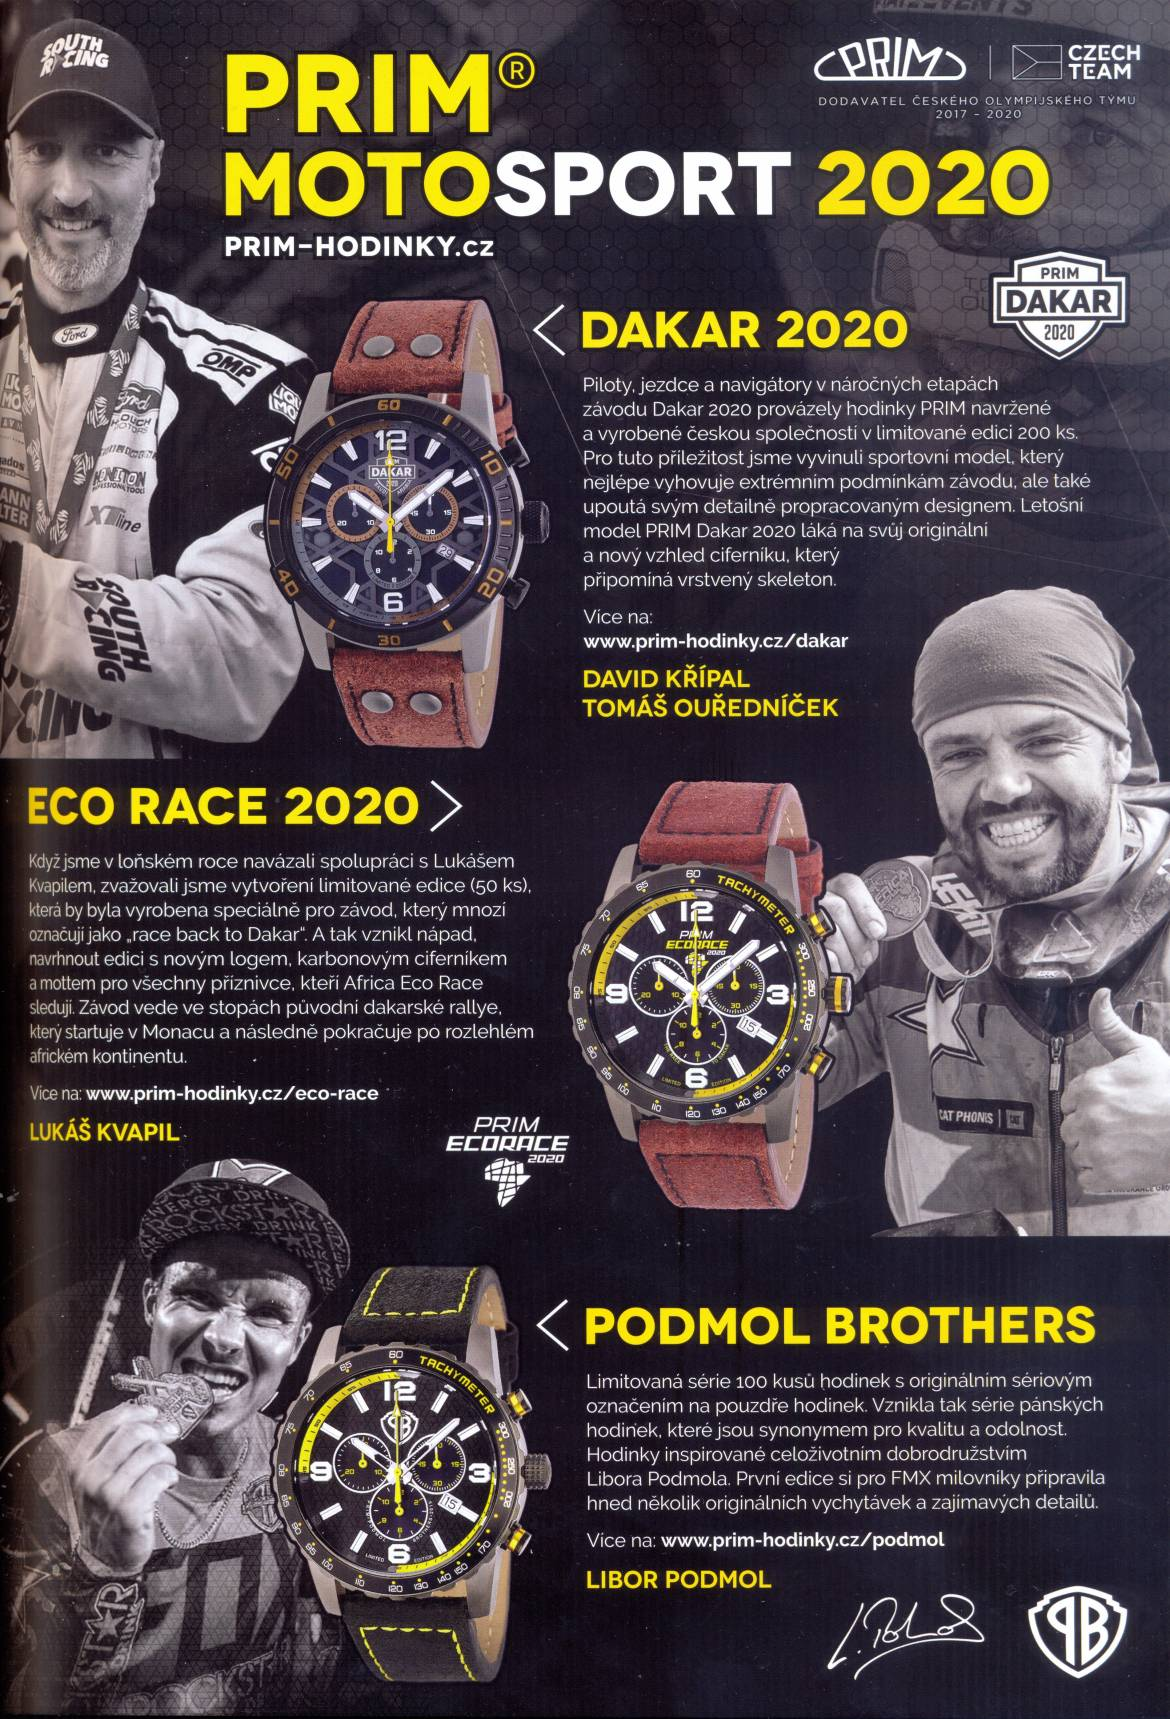 HS-012020-Prim-motosport.jpg